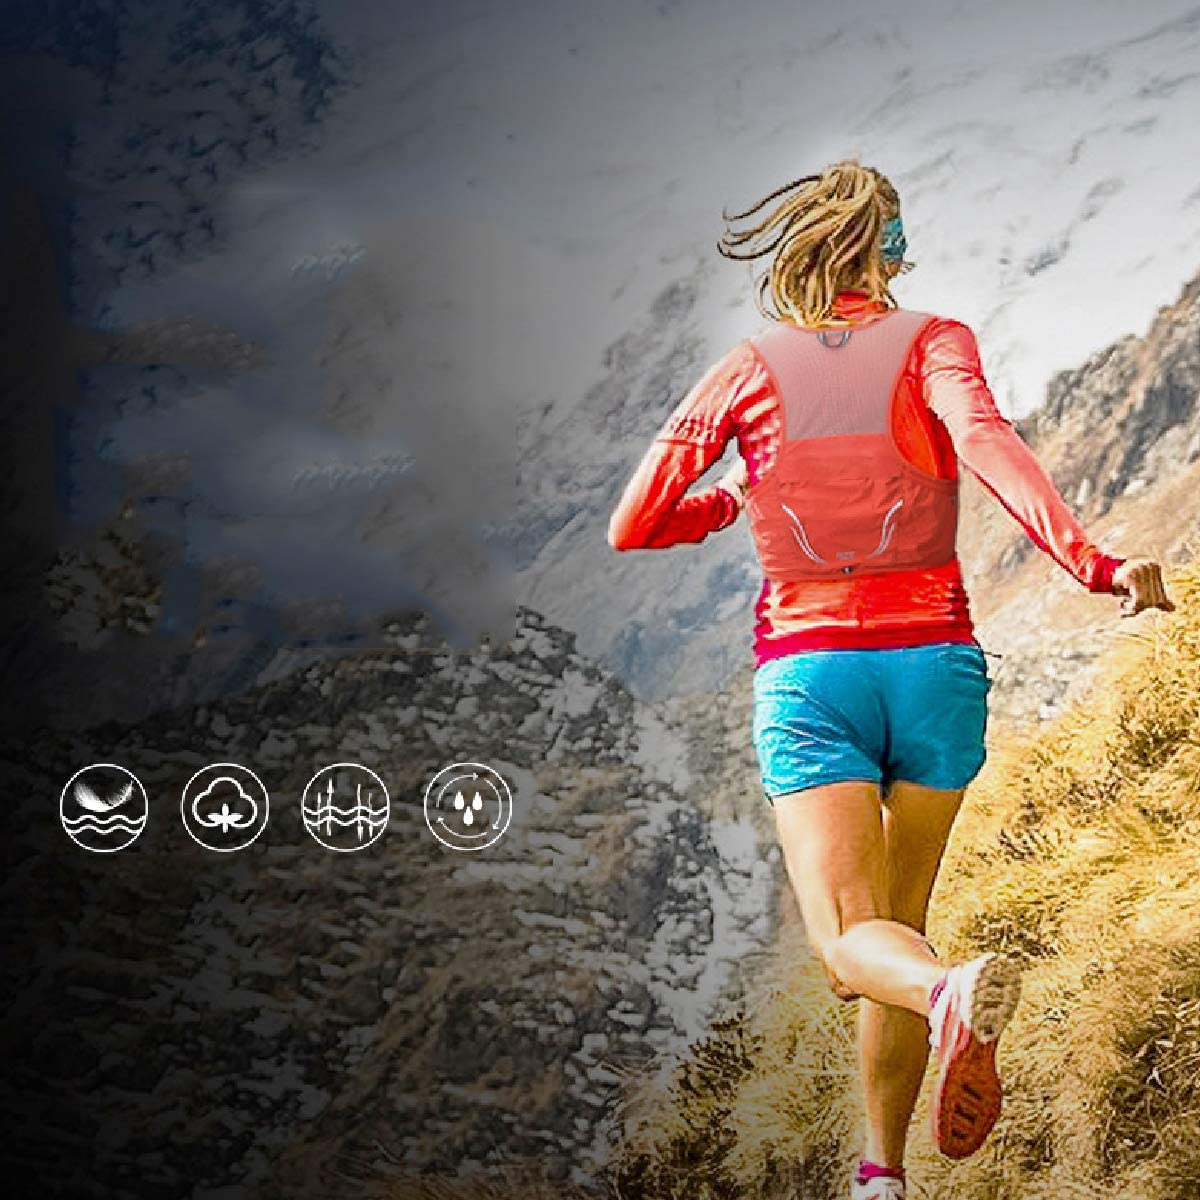 Azarxis Sac /à Dos Running Sac Trail 2,5L Gilet Trail Hydratation Sac dhydratation Trail L/éger pour Homme Femme Marathon Randonn/ée Escalade Course